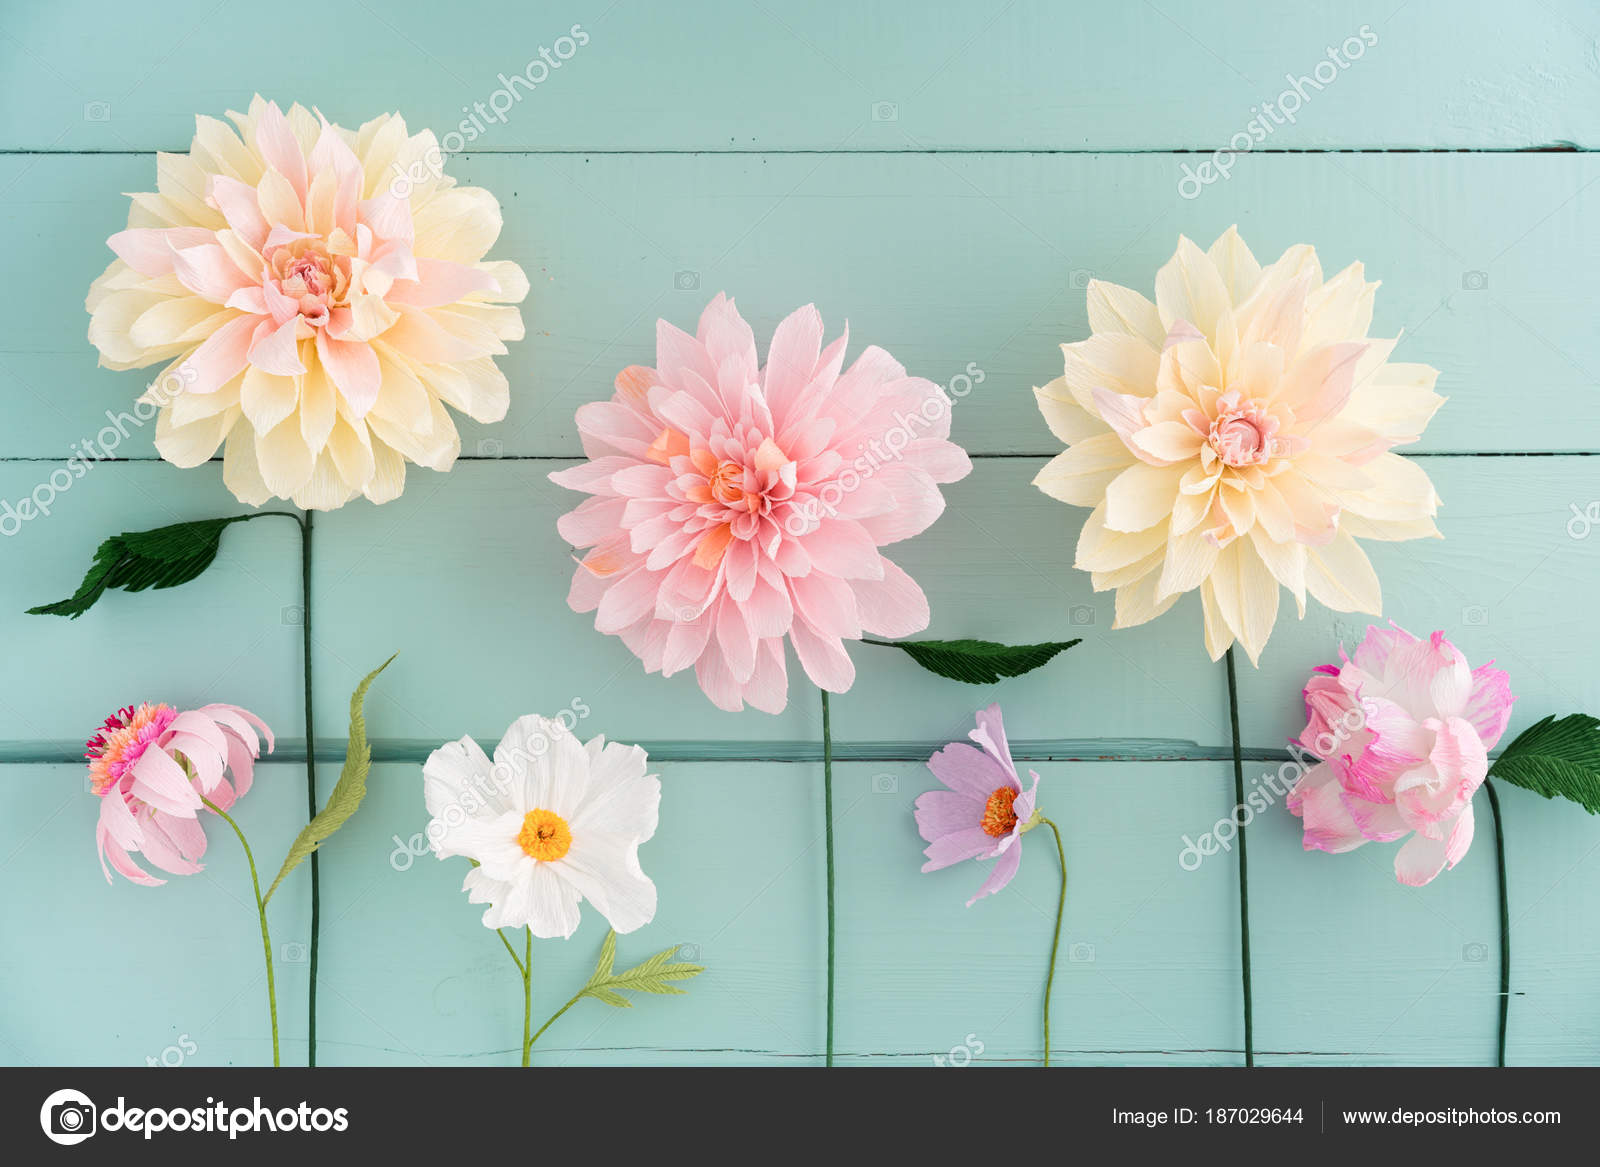 Fotos Flores De Papel Crepom Flores De Papel Crepe Foto De - Flores-de-papel-crepe